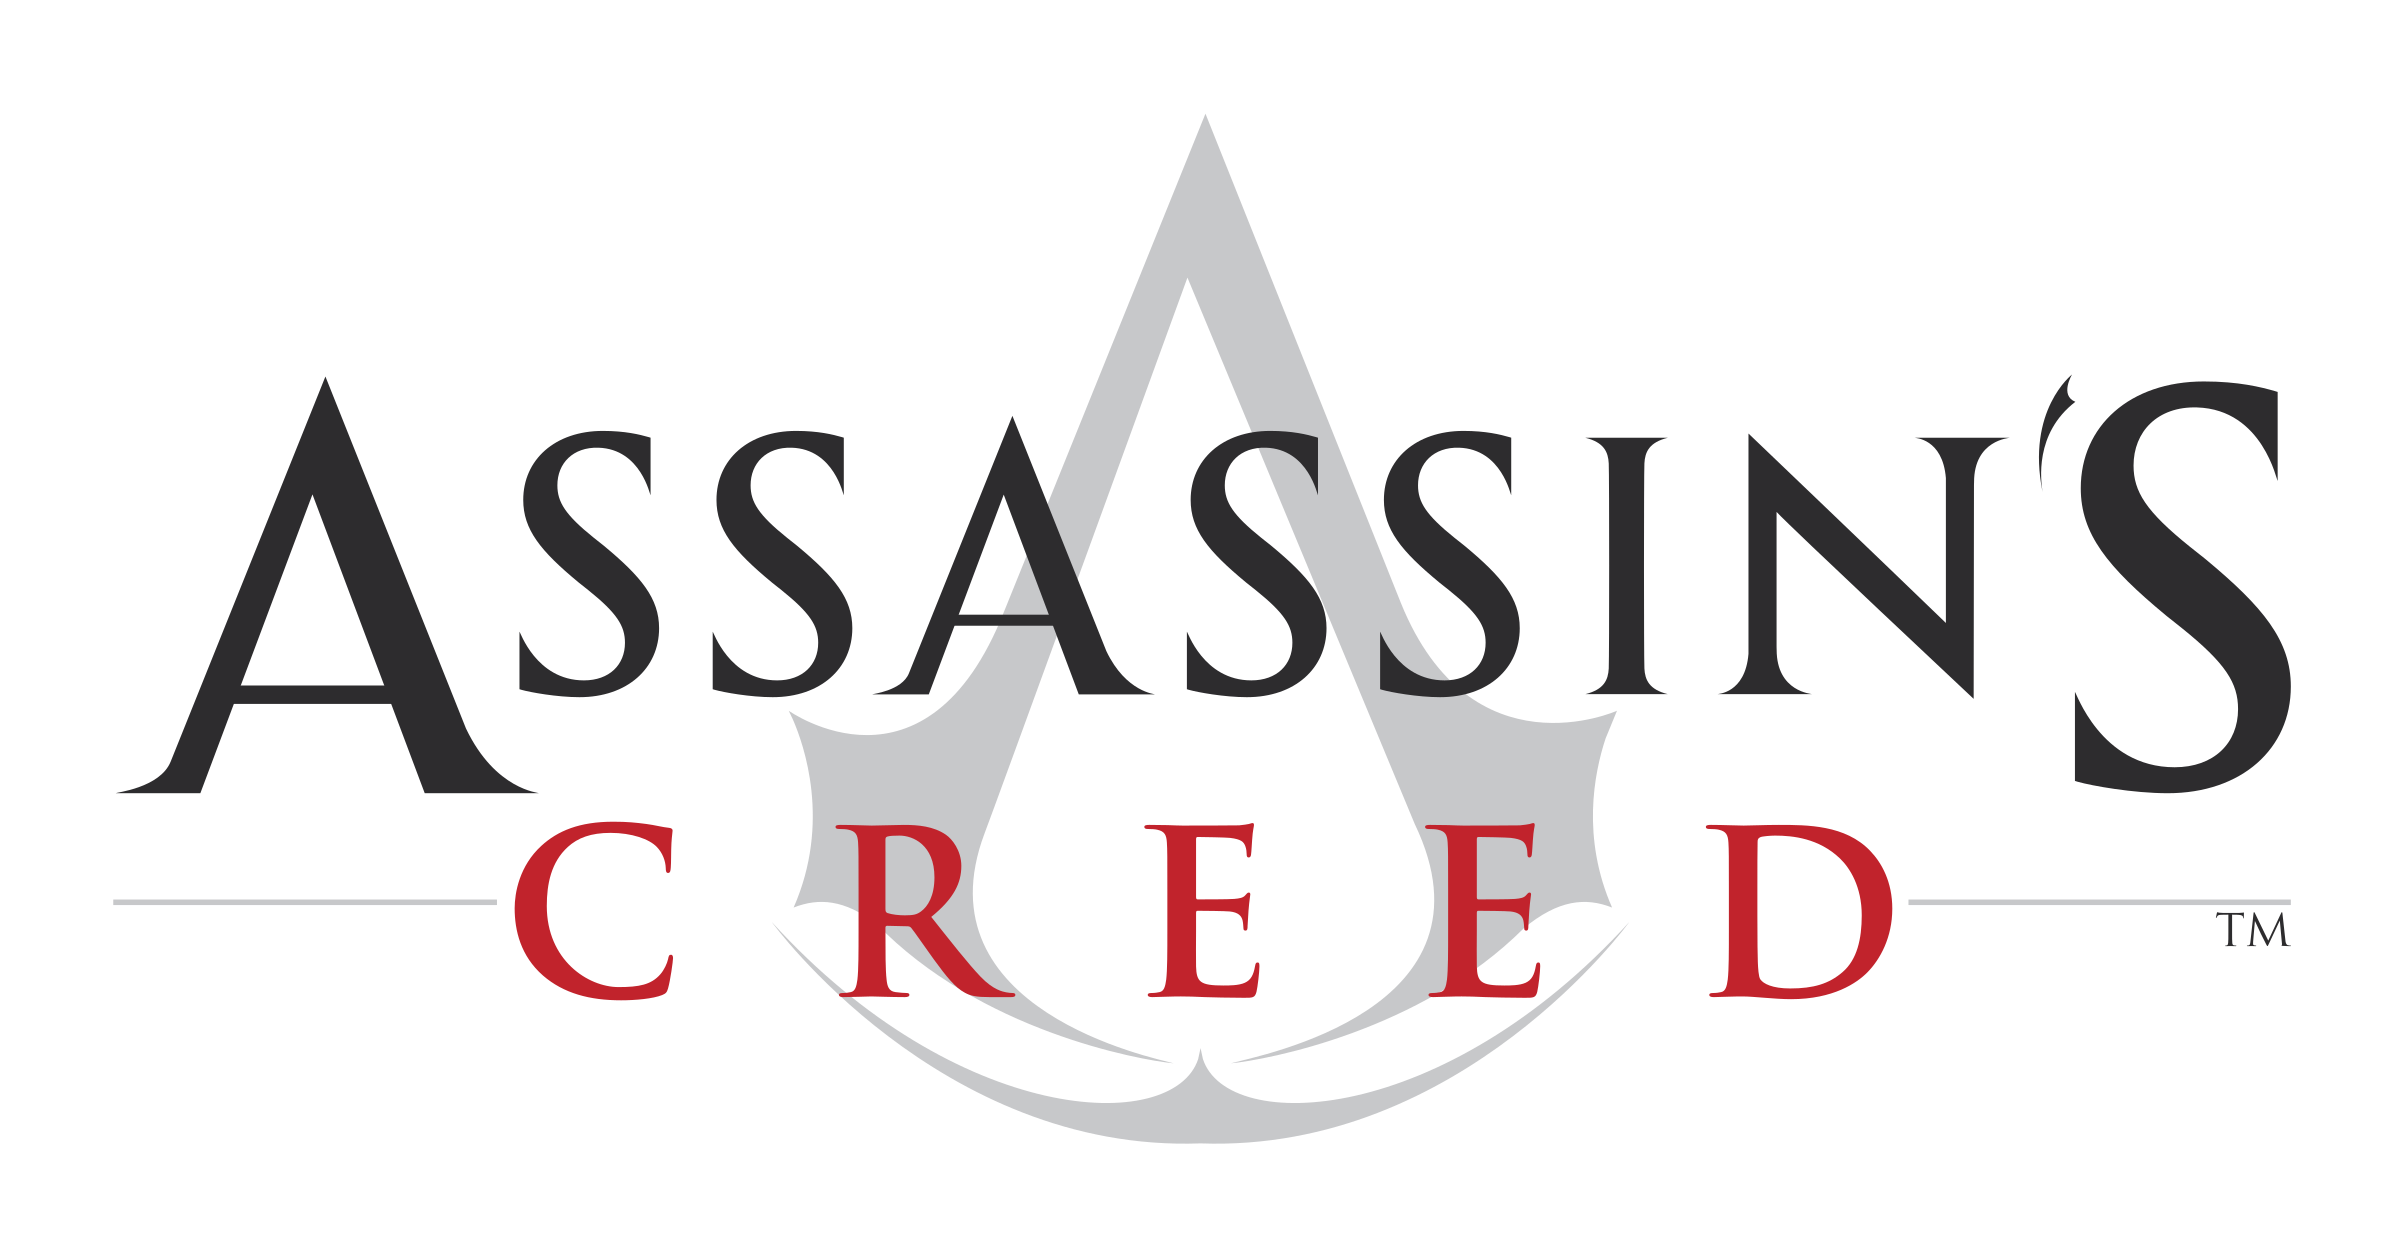 Assassins Creed Logo PNG Transparent & SVG Vector.